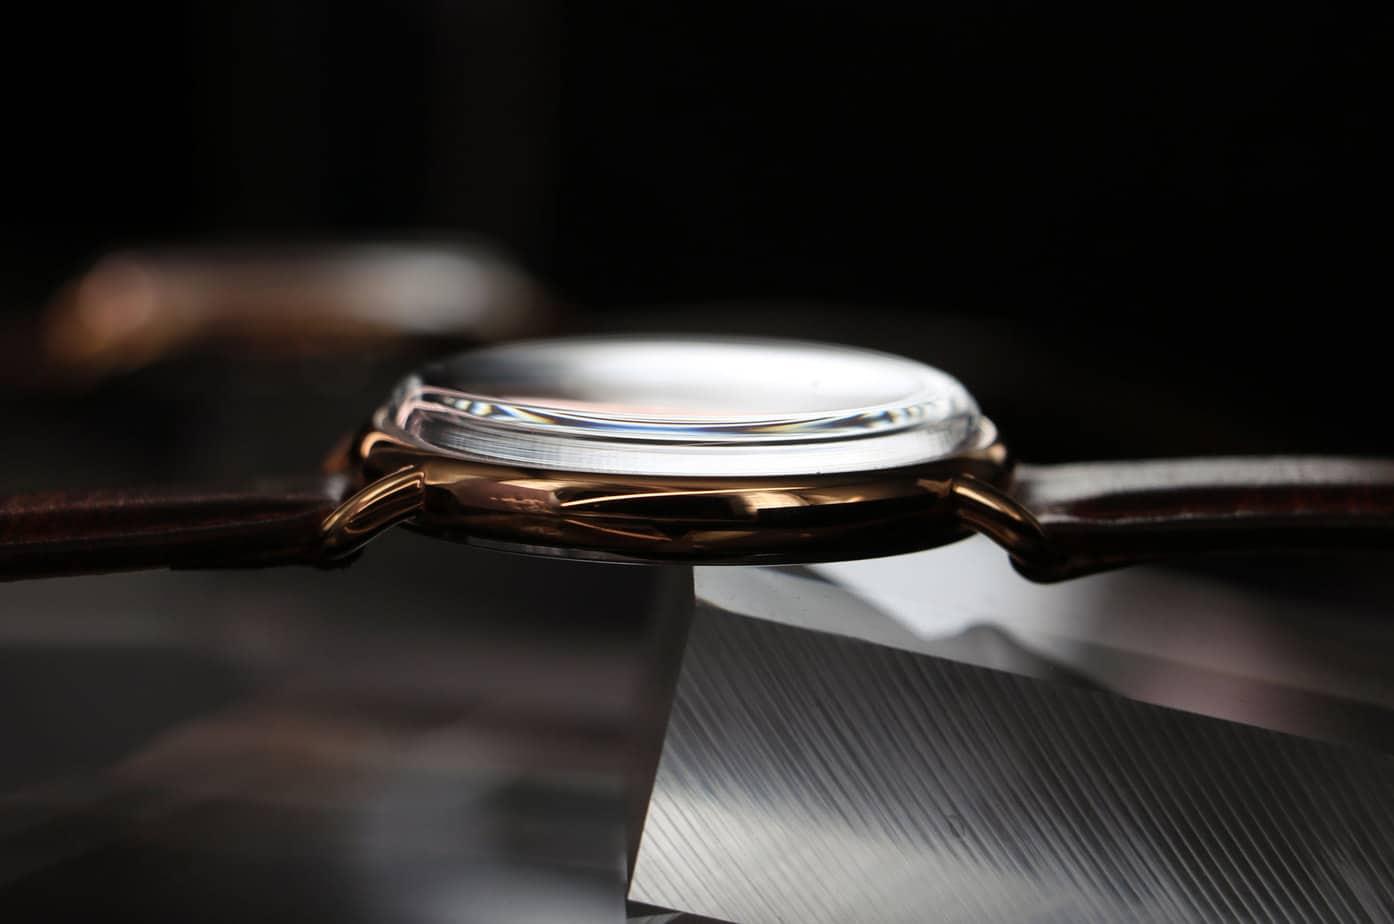 prisma dome watch glass horloge retro vintage herenhorloges